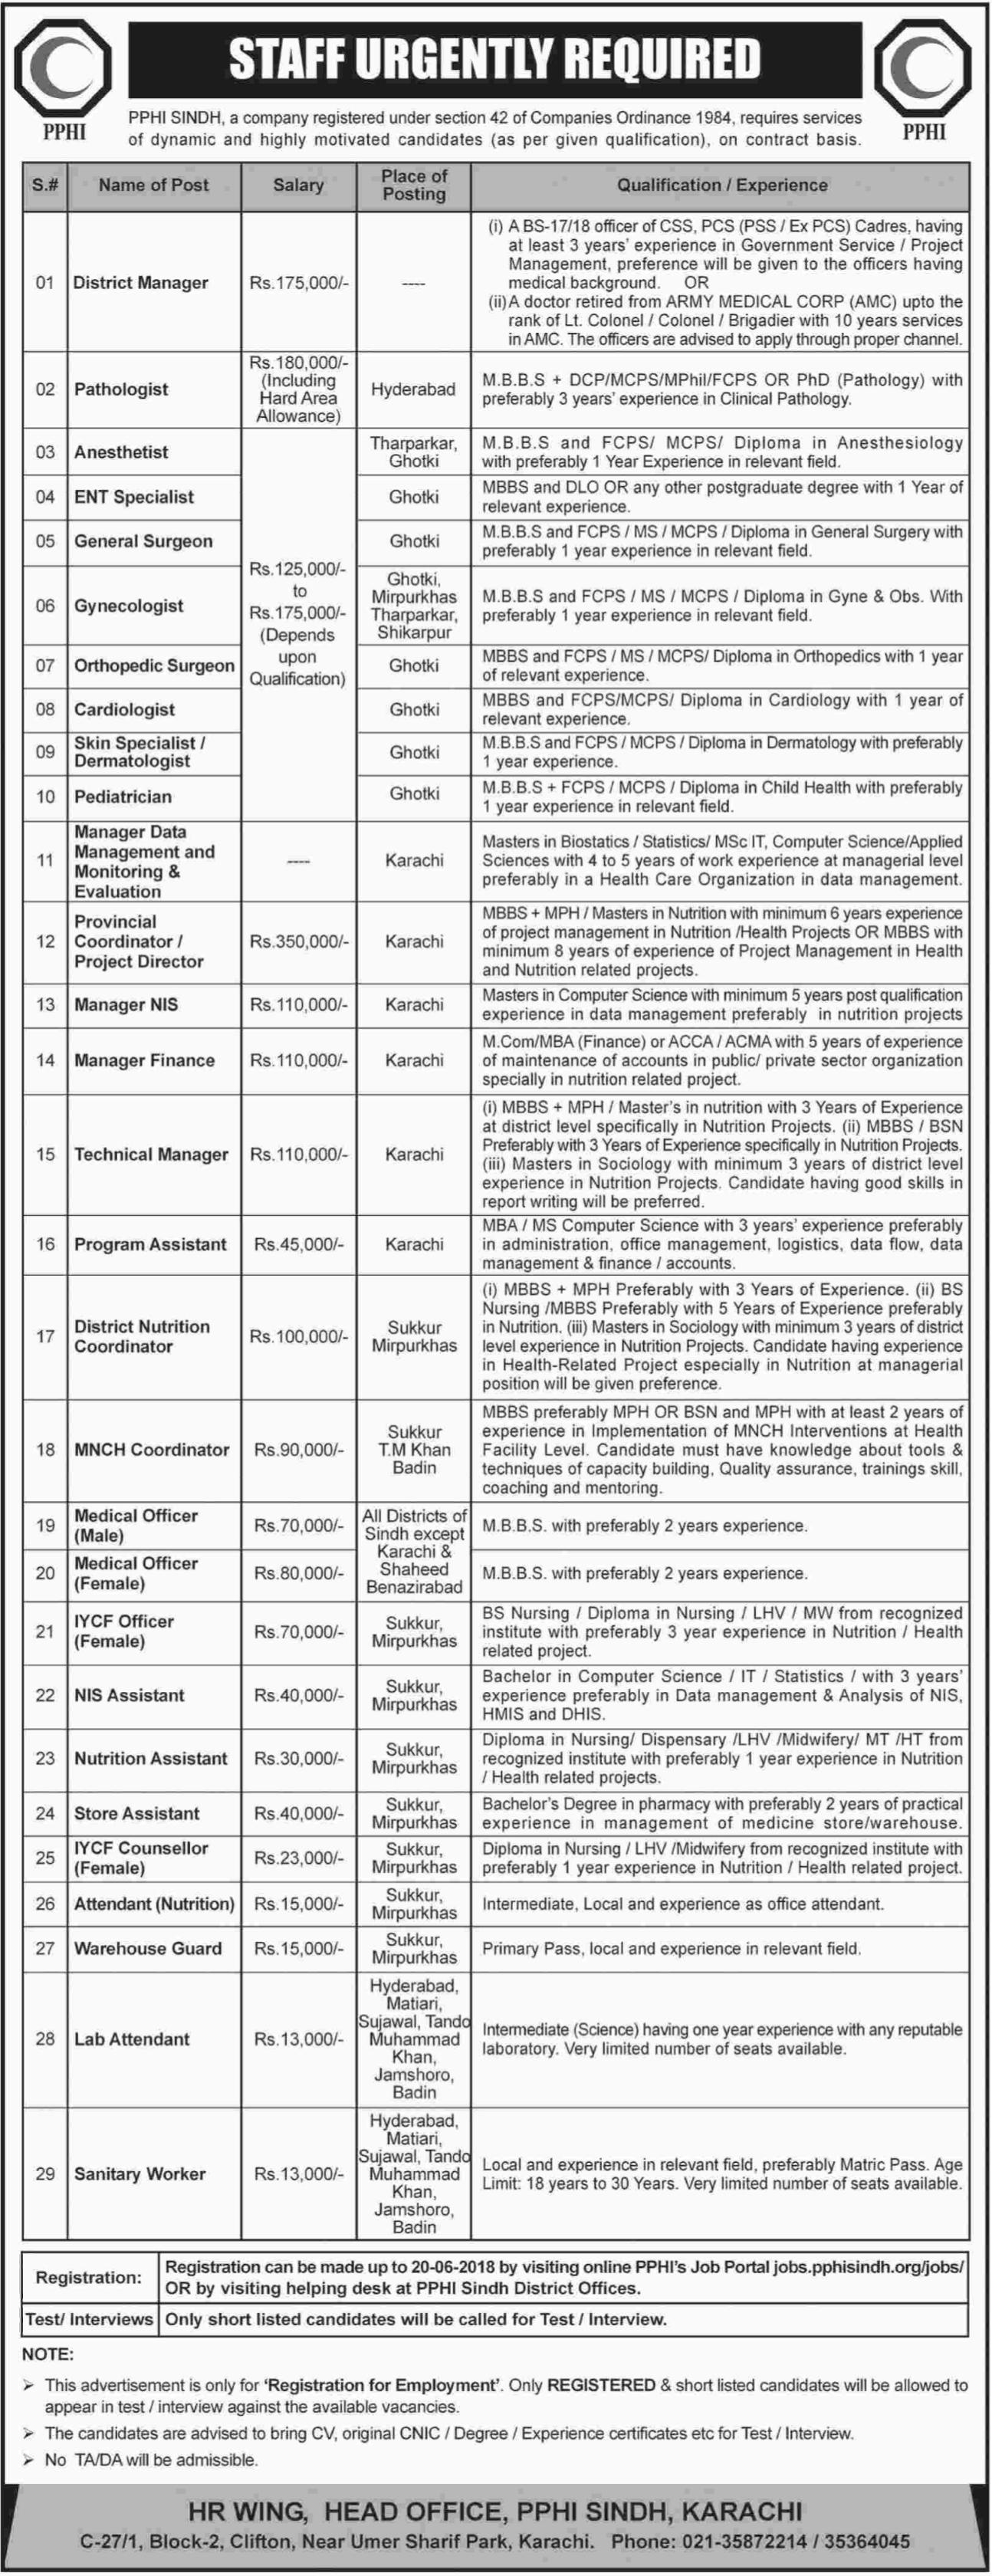 PPHI Sindh Jobs In Hyderabad, Tharparkar, Ghotki, Karachi